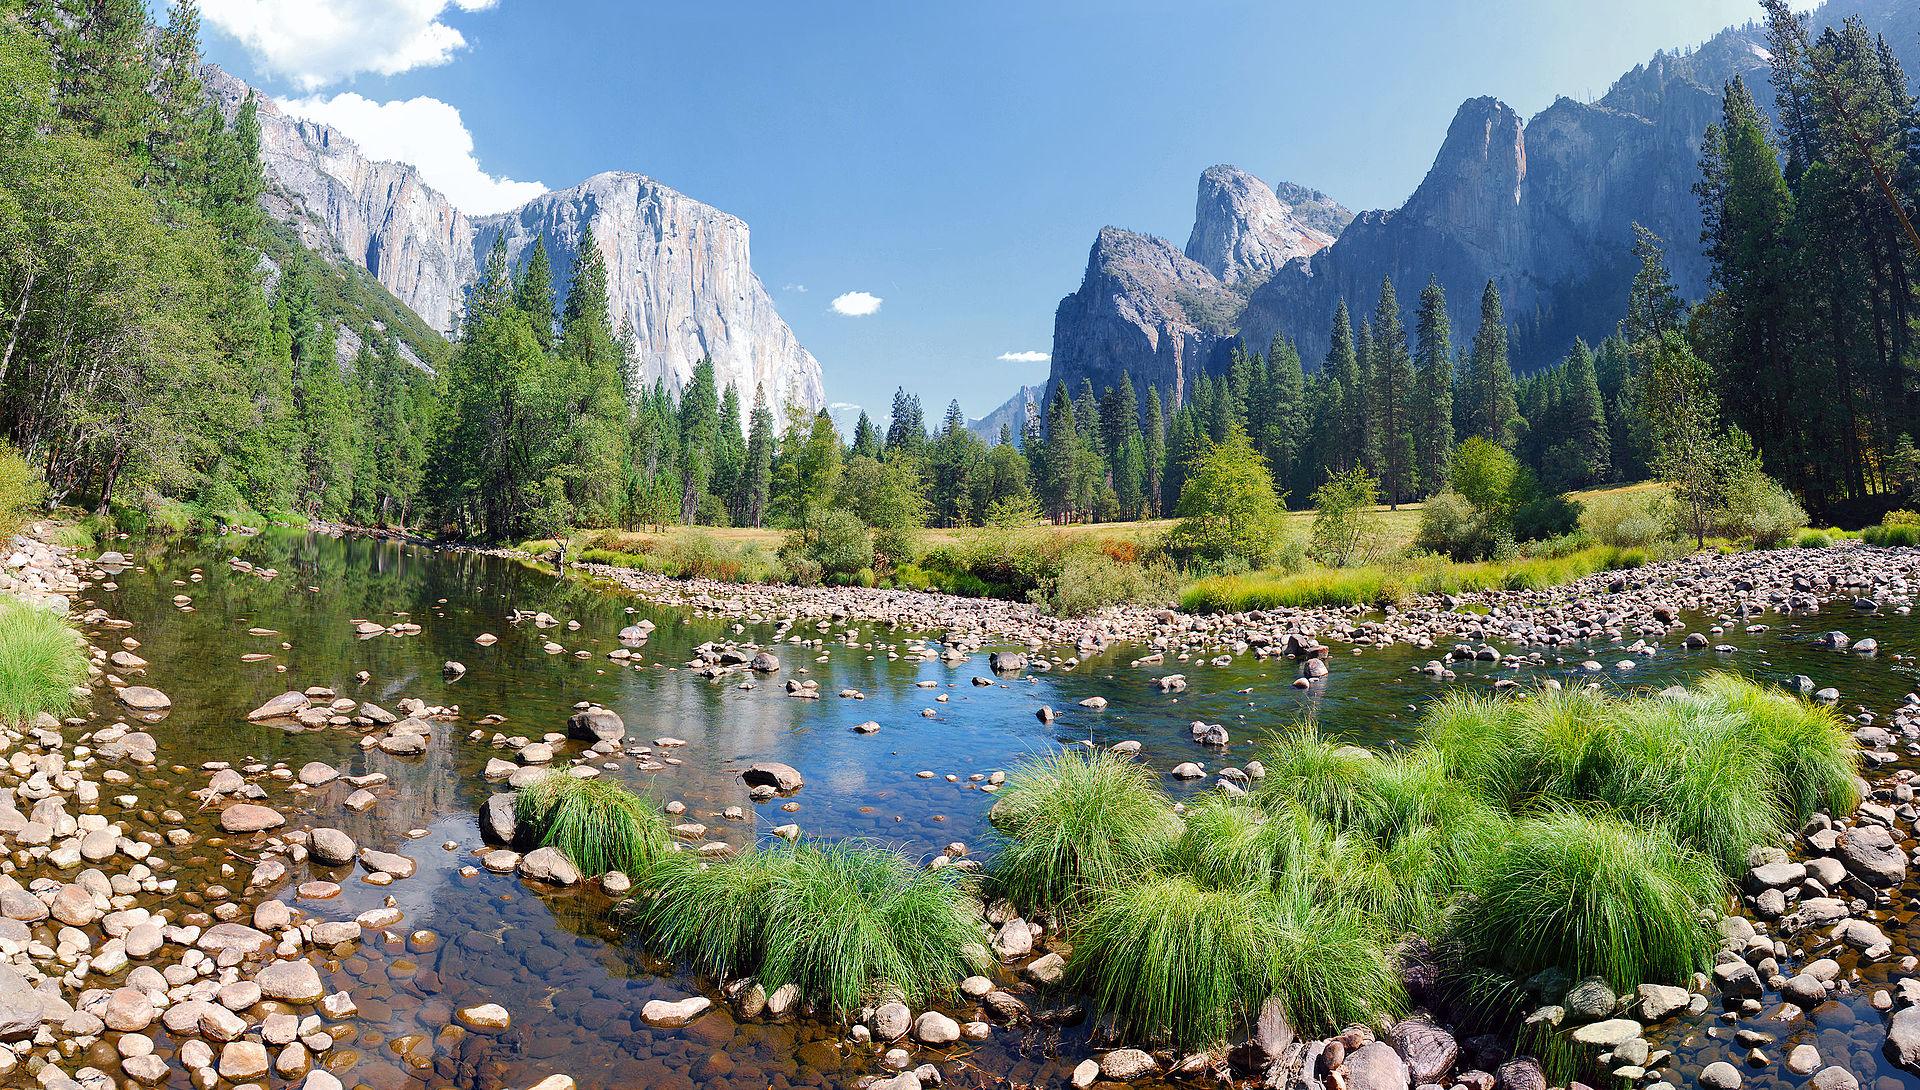 Yosemite Valley from Merced River | photo credit Kylir Horton via wikipedia dot org